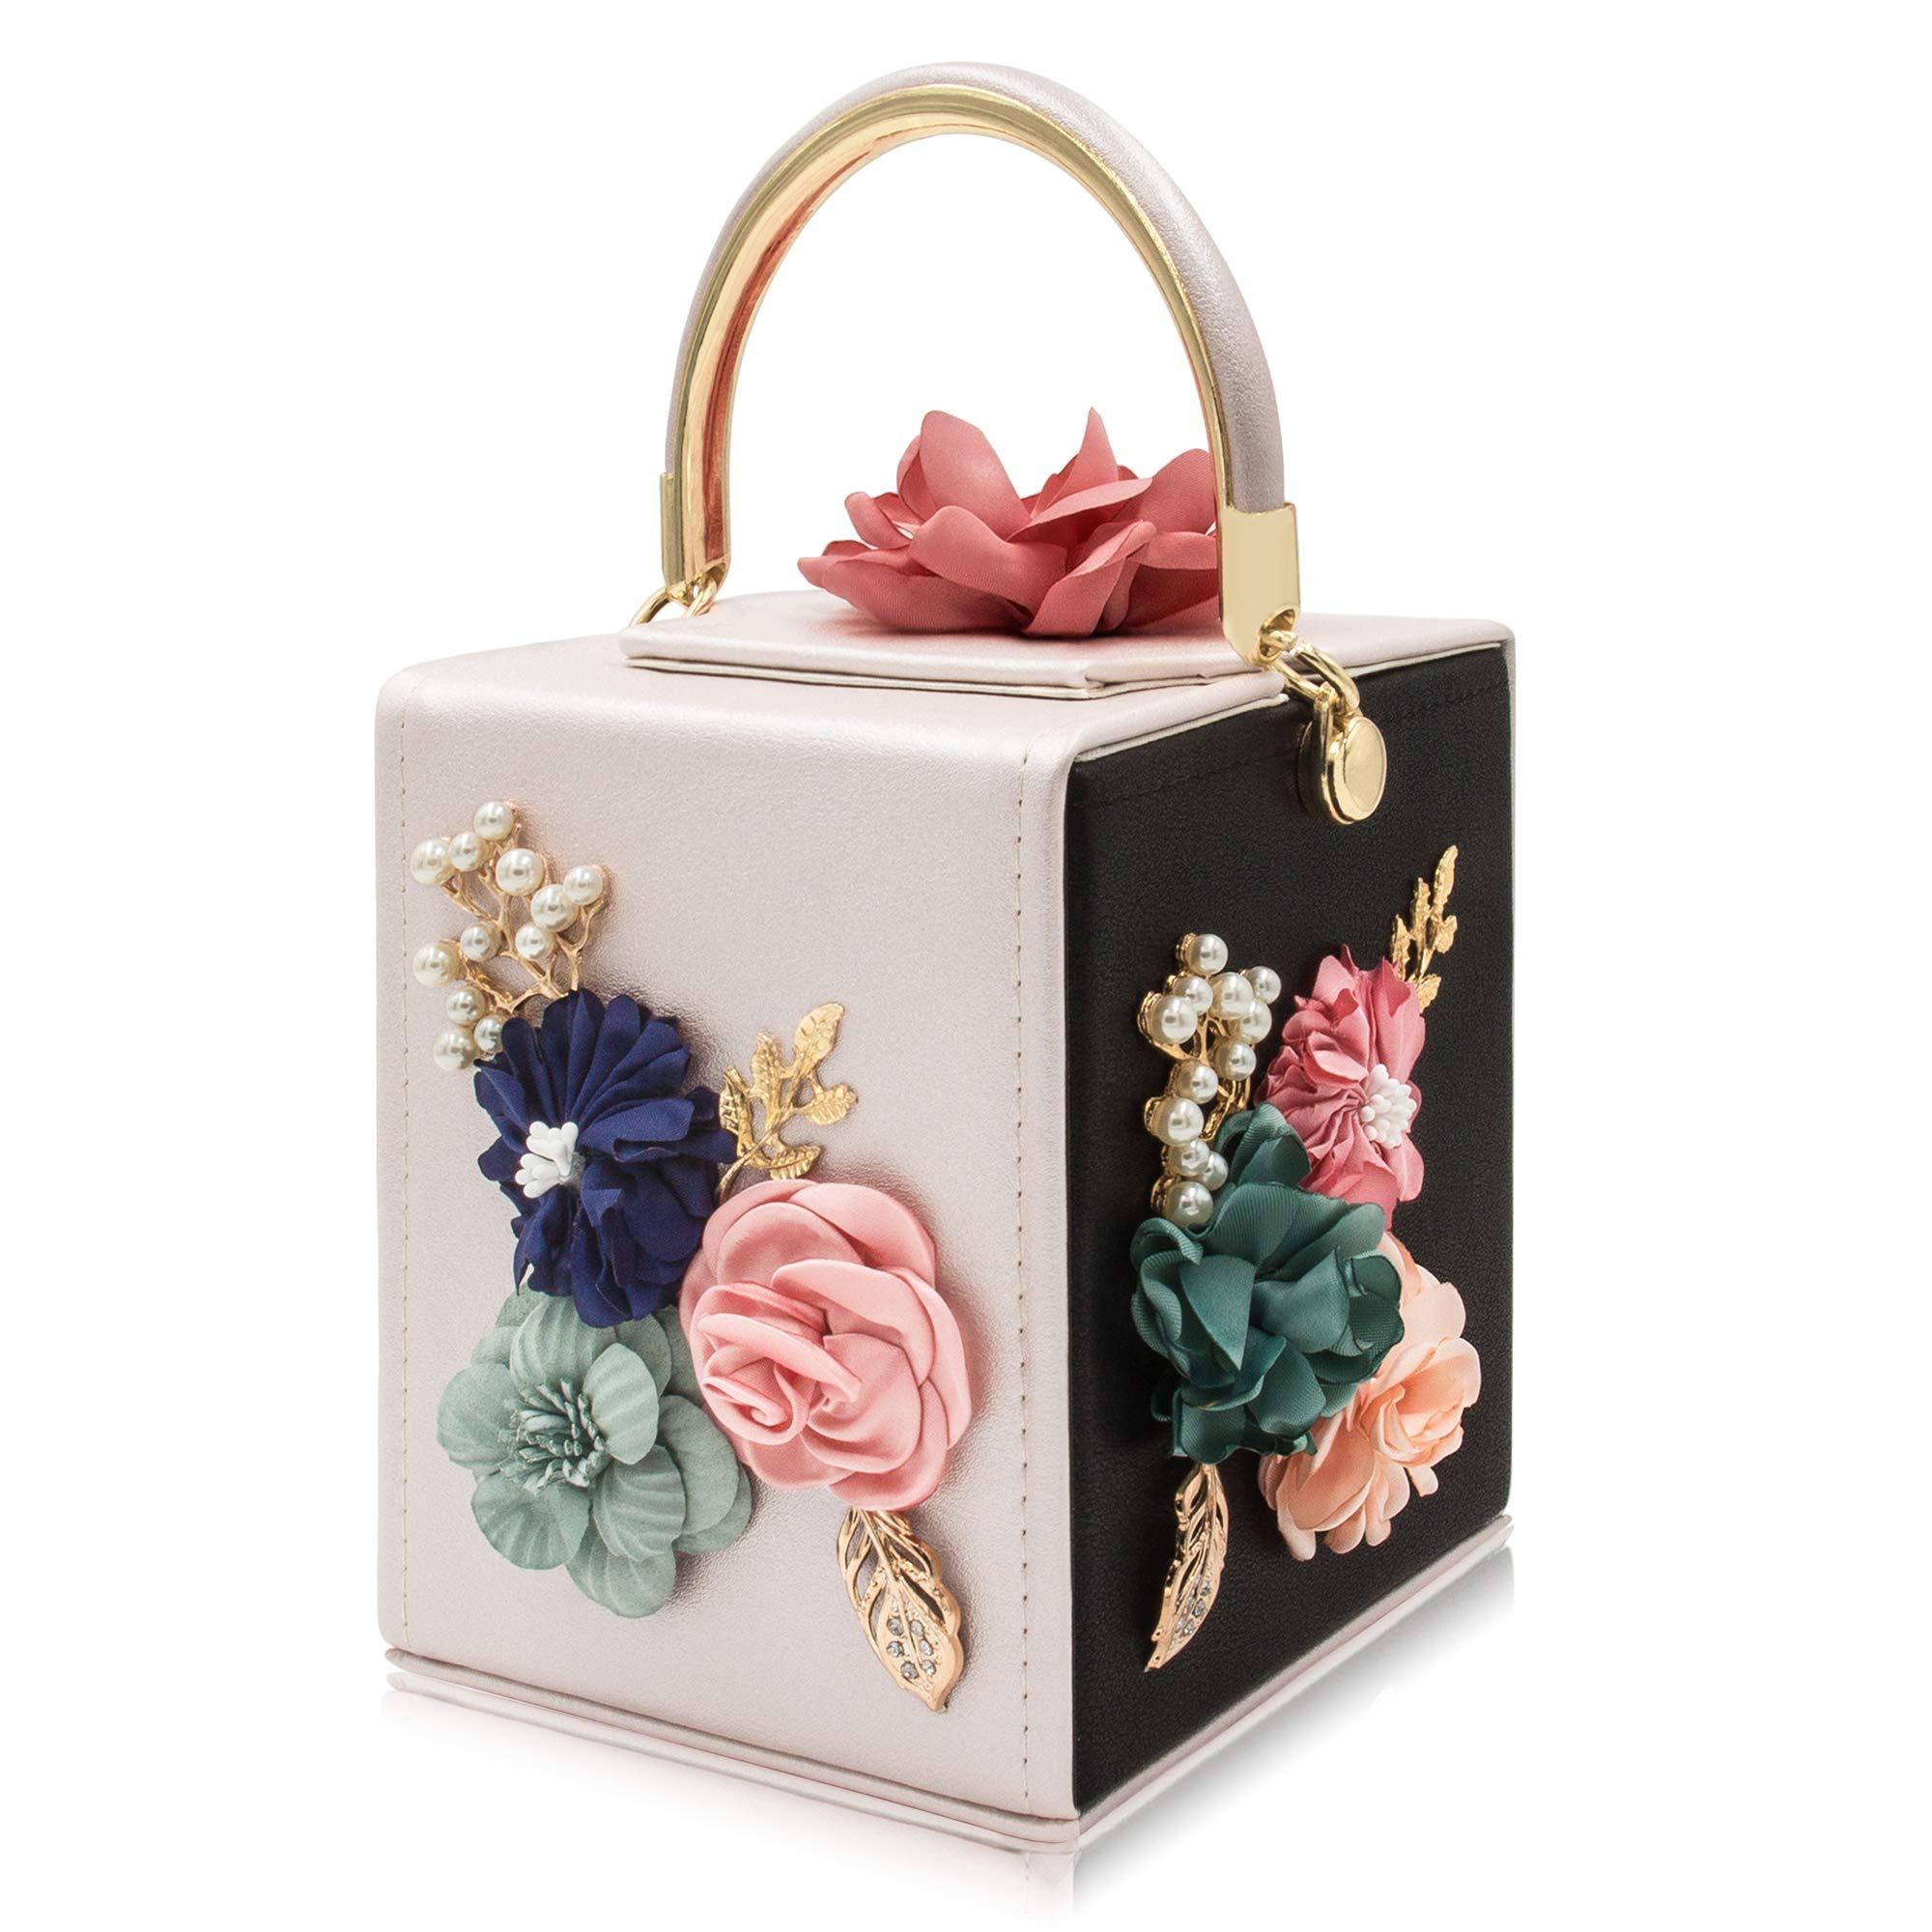 Milisente Women Clutches Flower Clutch Bag Box Clutch Purse Evening Handbag (Black Beige)